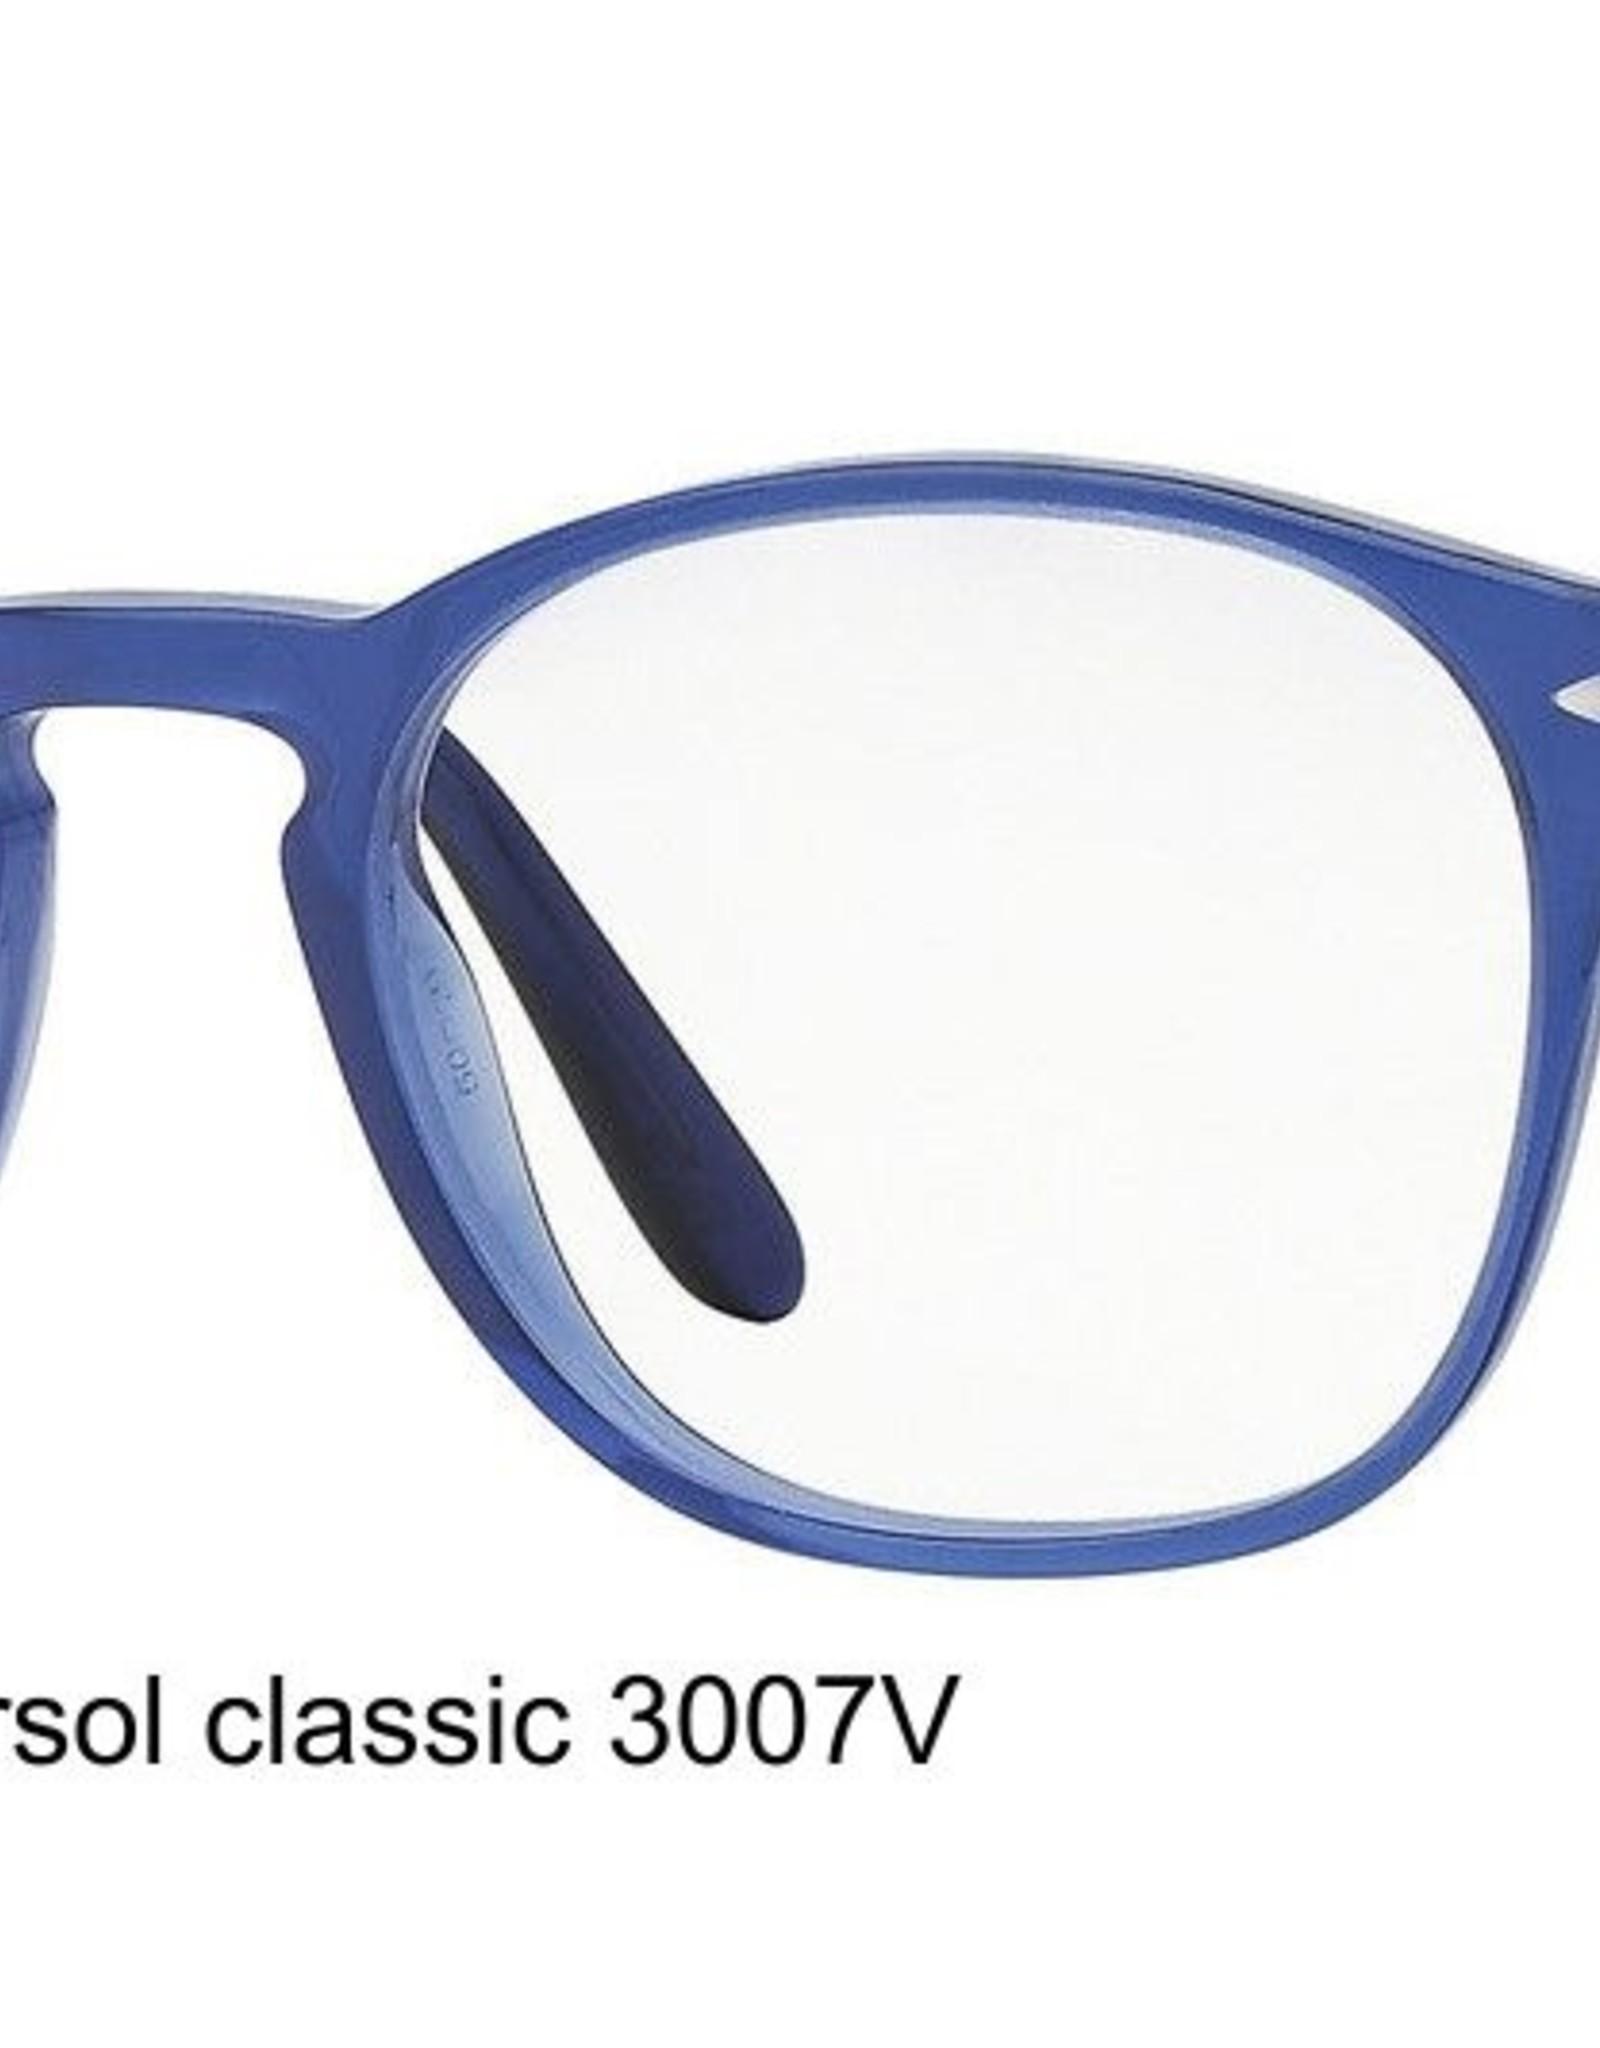 Persol Persol 3007